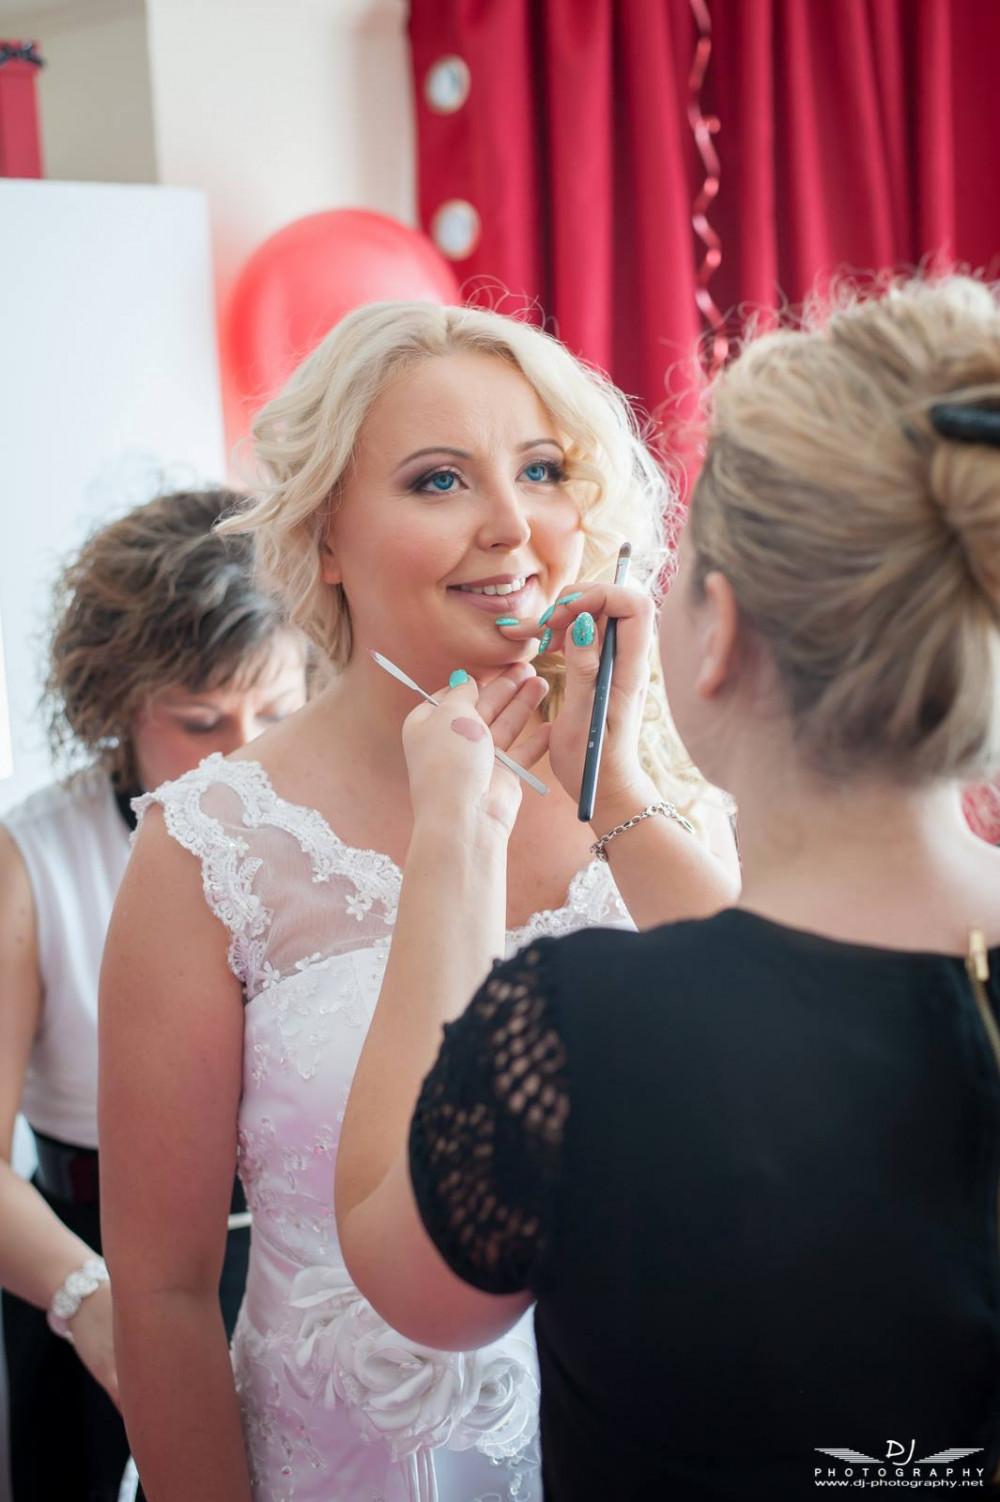 Final touches just before the ceremony! Makeup by ZydreZi - Make Me Bridal Artist: ZydreZi. #naturalmakeup #blonde #weddingmorning #gettingready #bridalmakeup #meatwork #prep #elegant #perfectmakeup #weddingmakeup #naturalweddingmakeup #softcurls